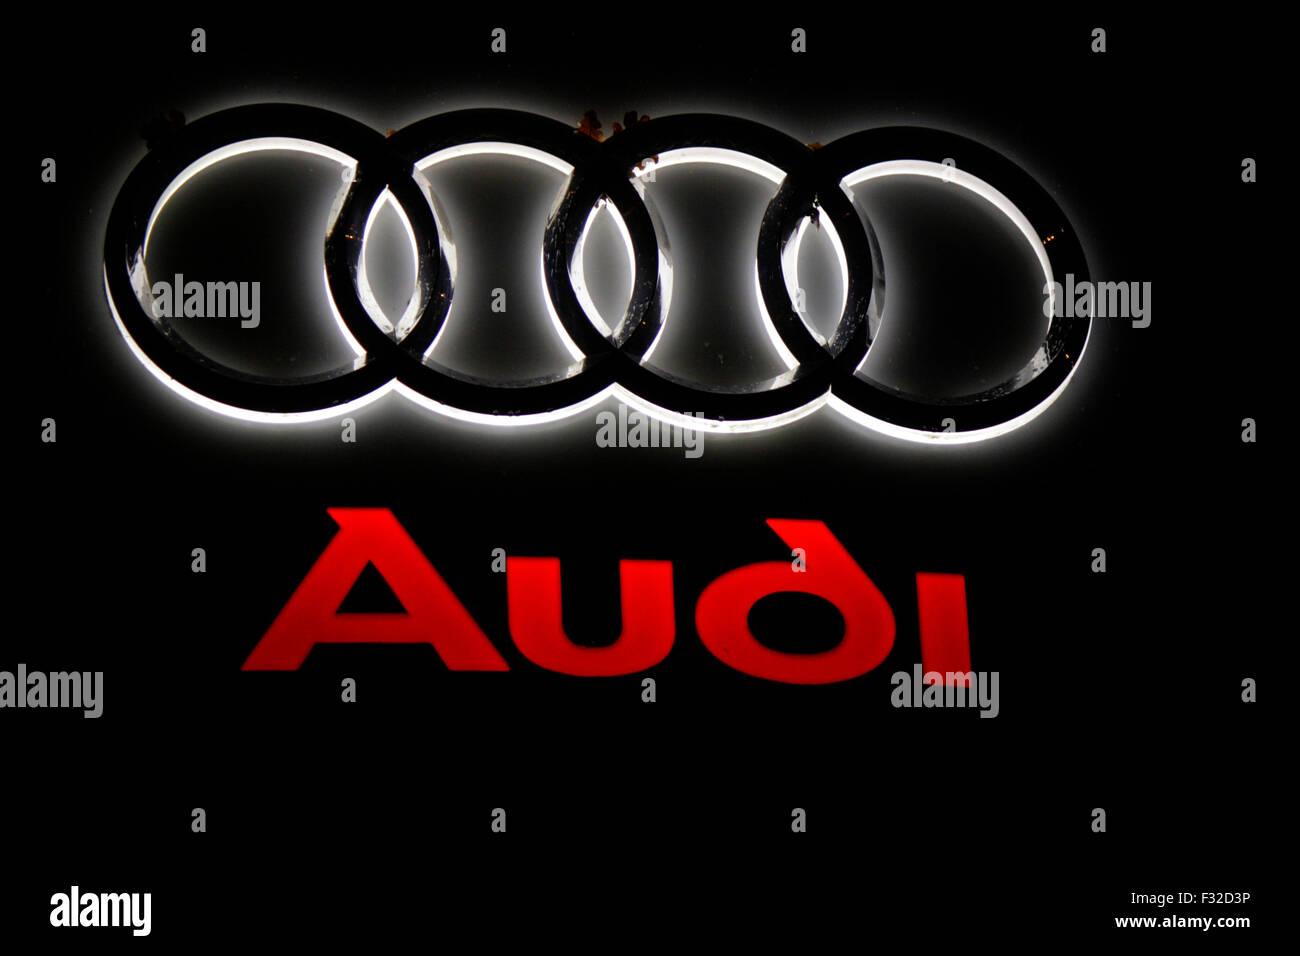 Markenname: 'Audi', Berlin. - Stock Image